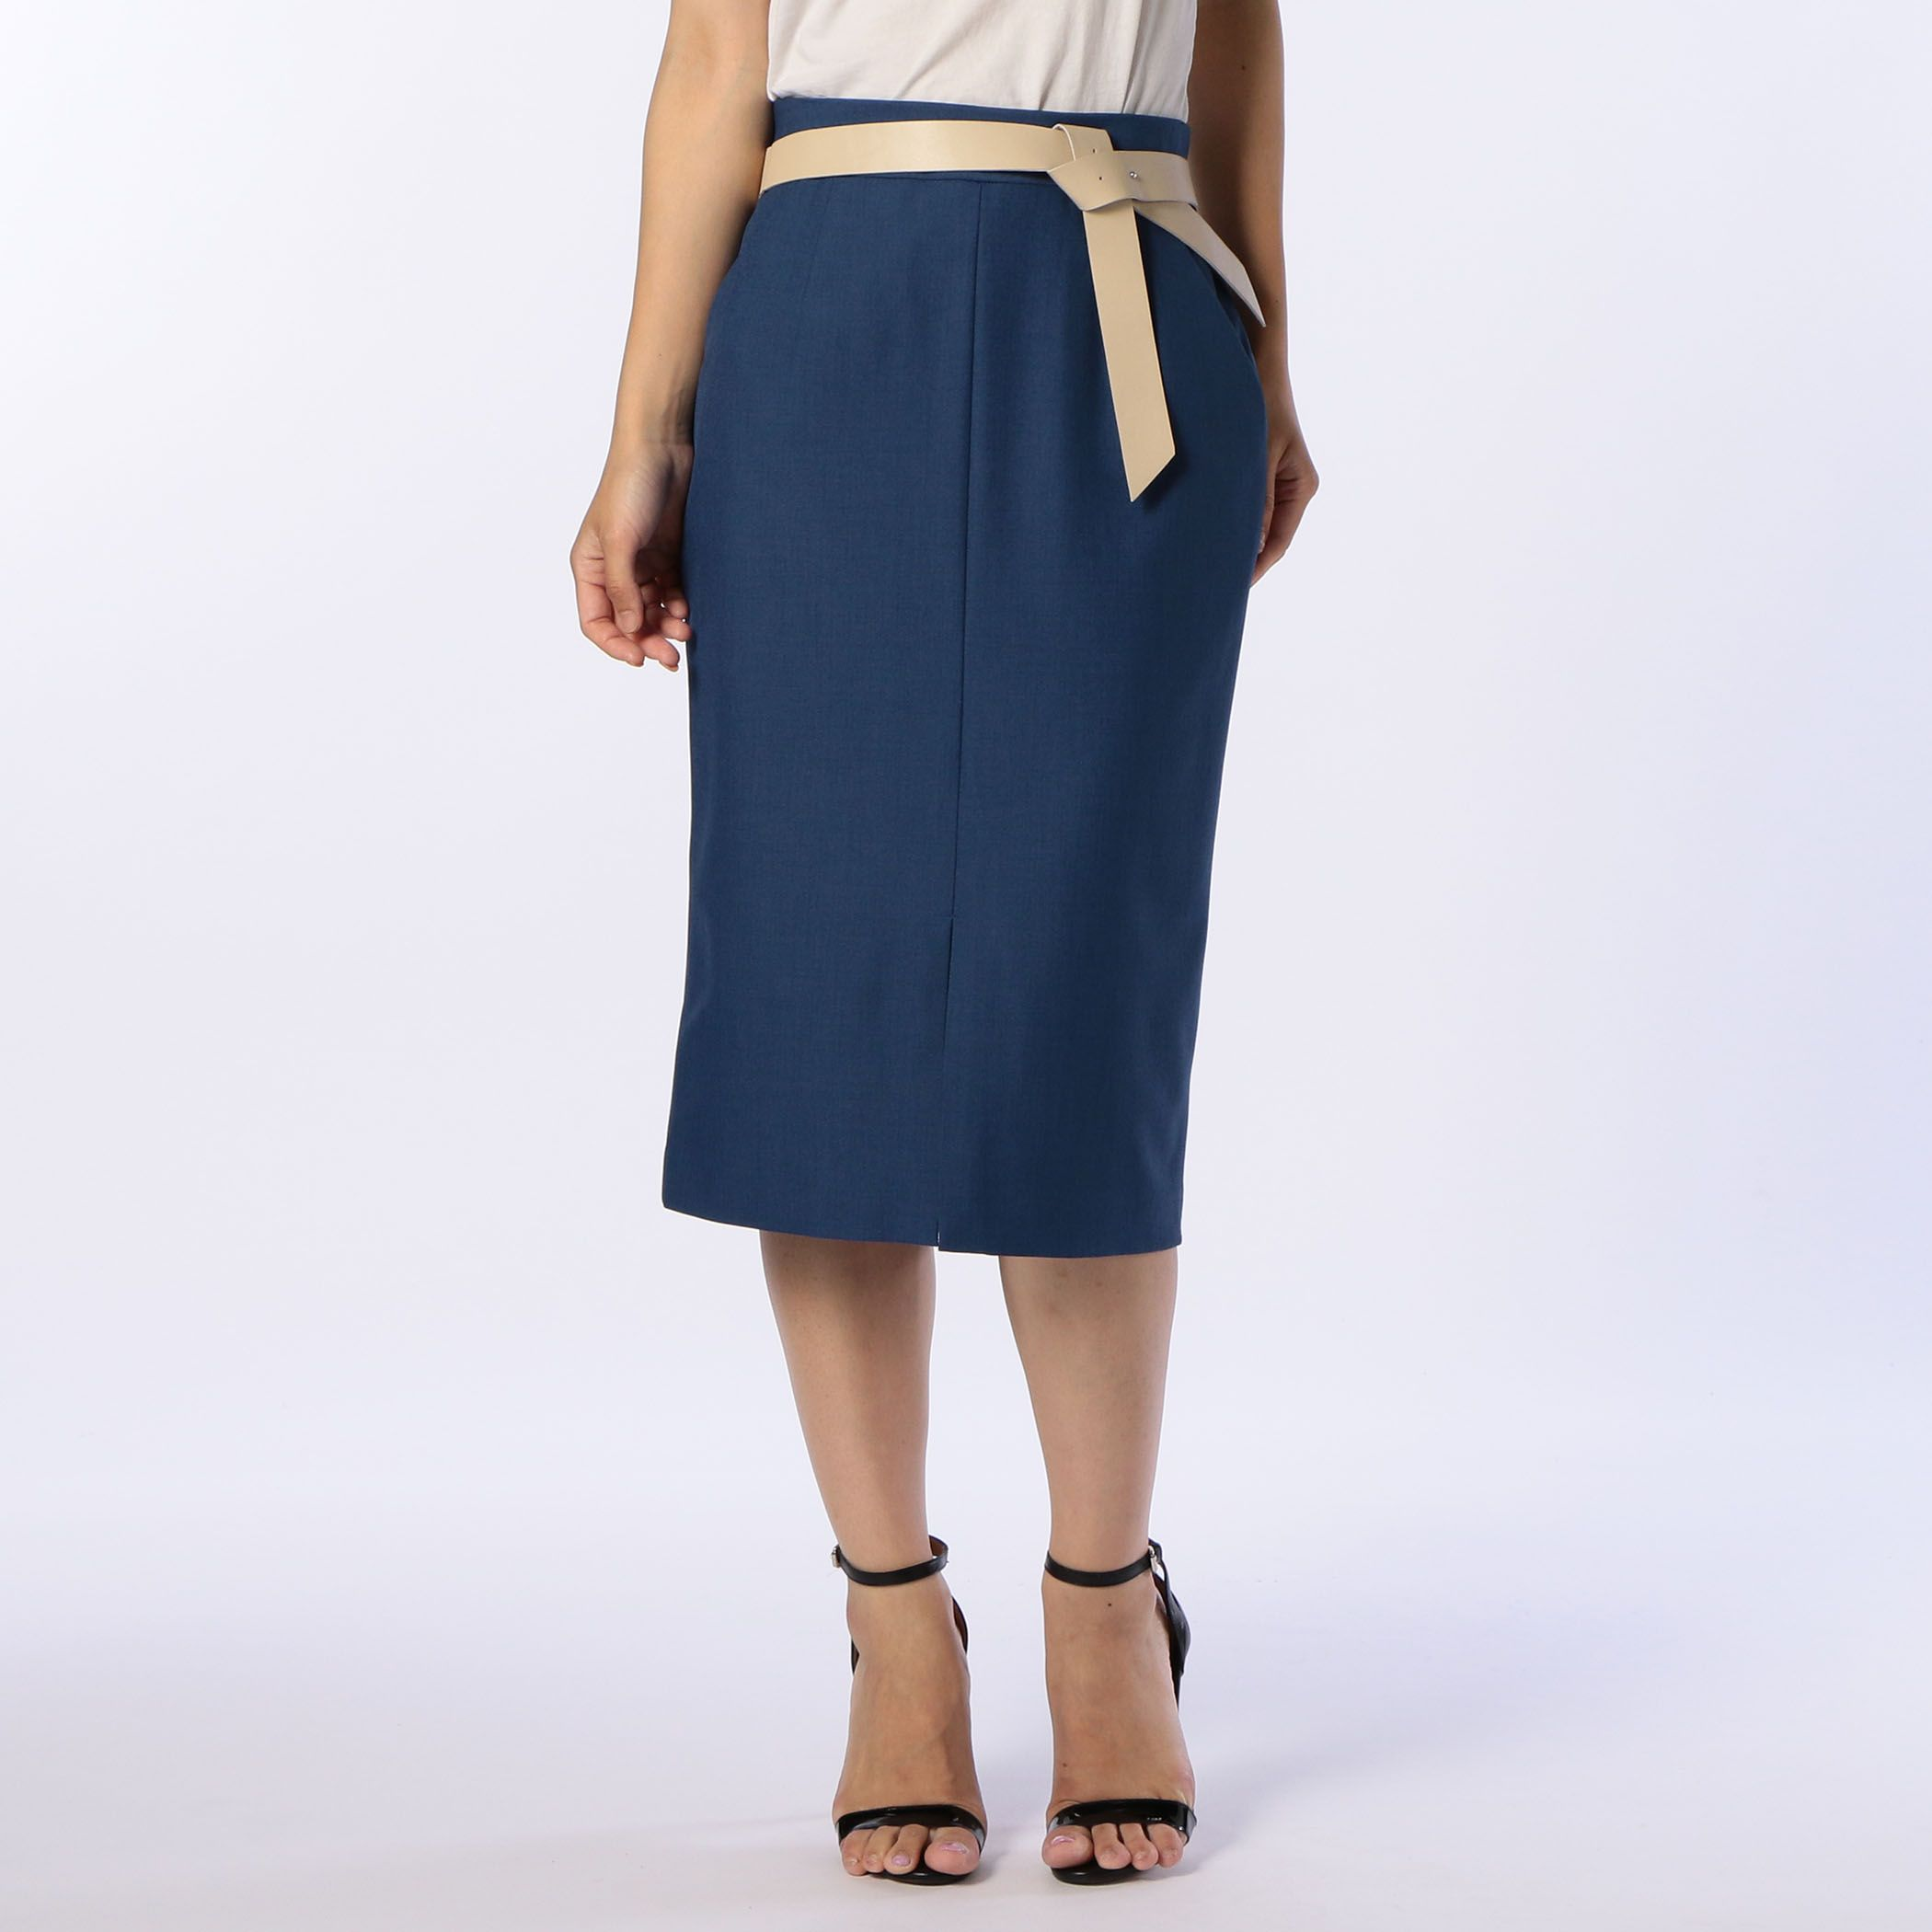 NOLLEY'Sノーリーズ/ベルト付きタイトスカート